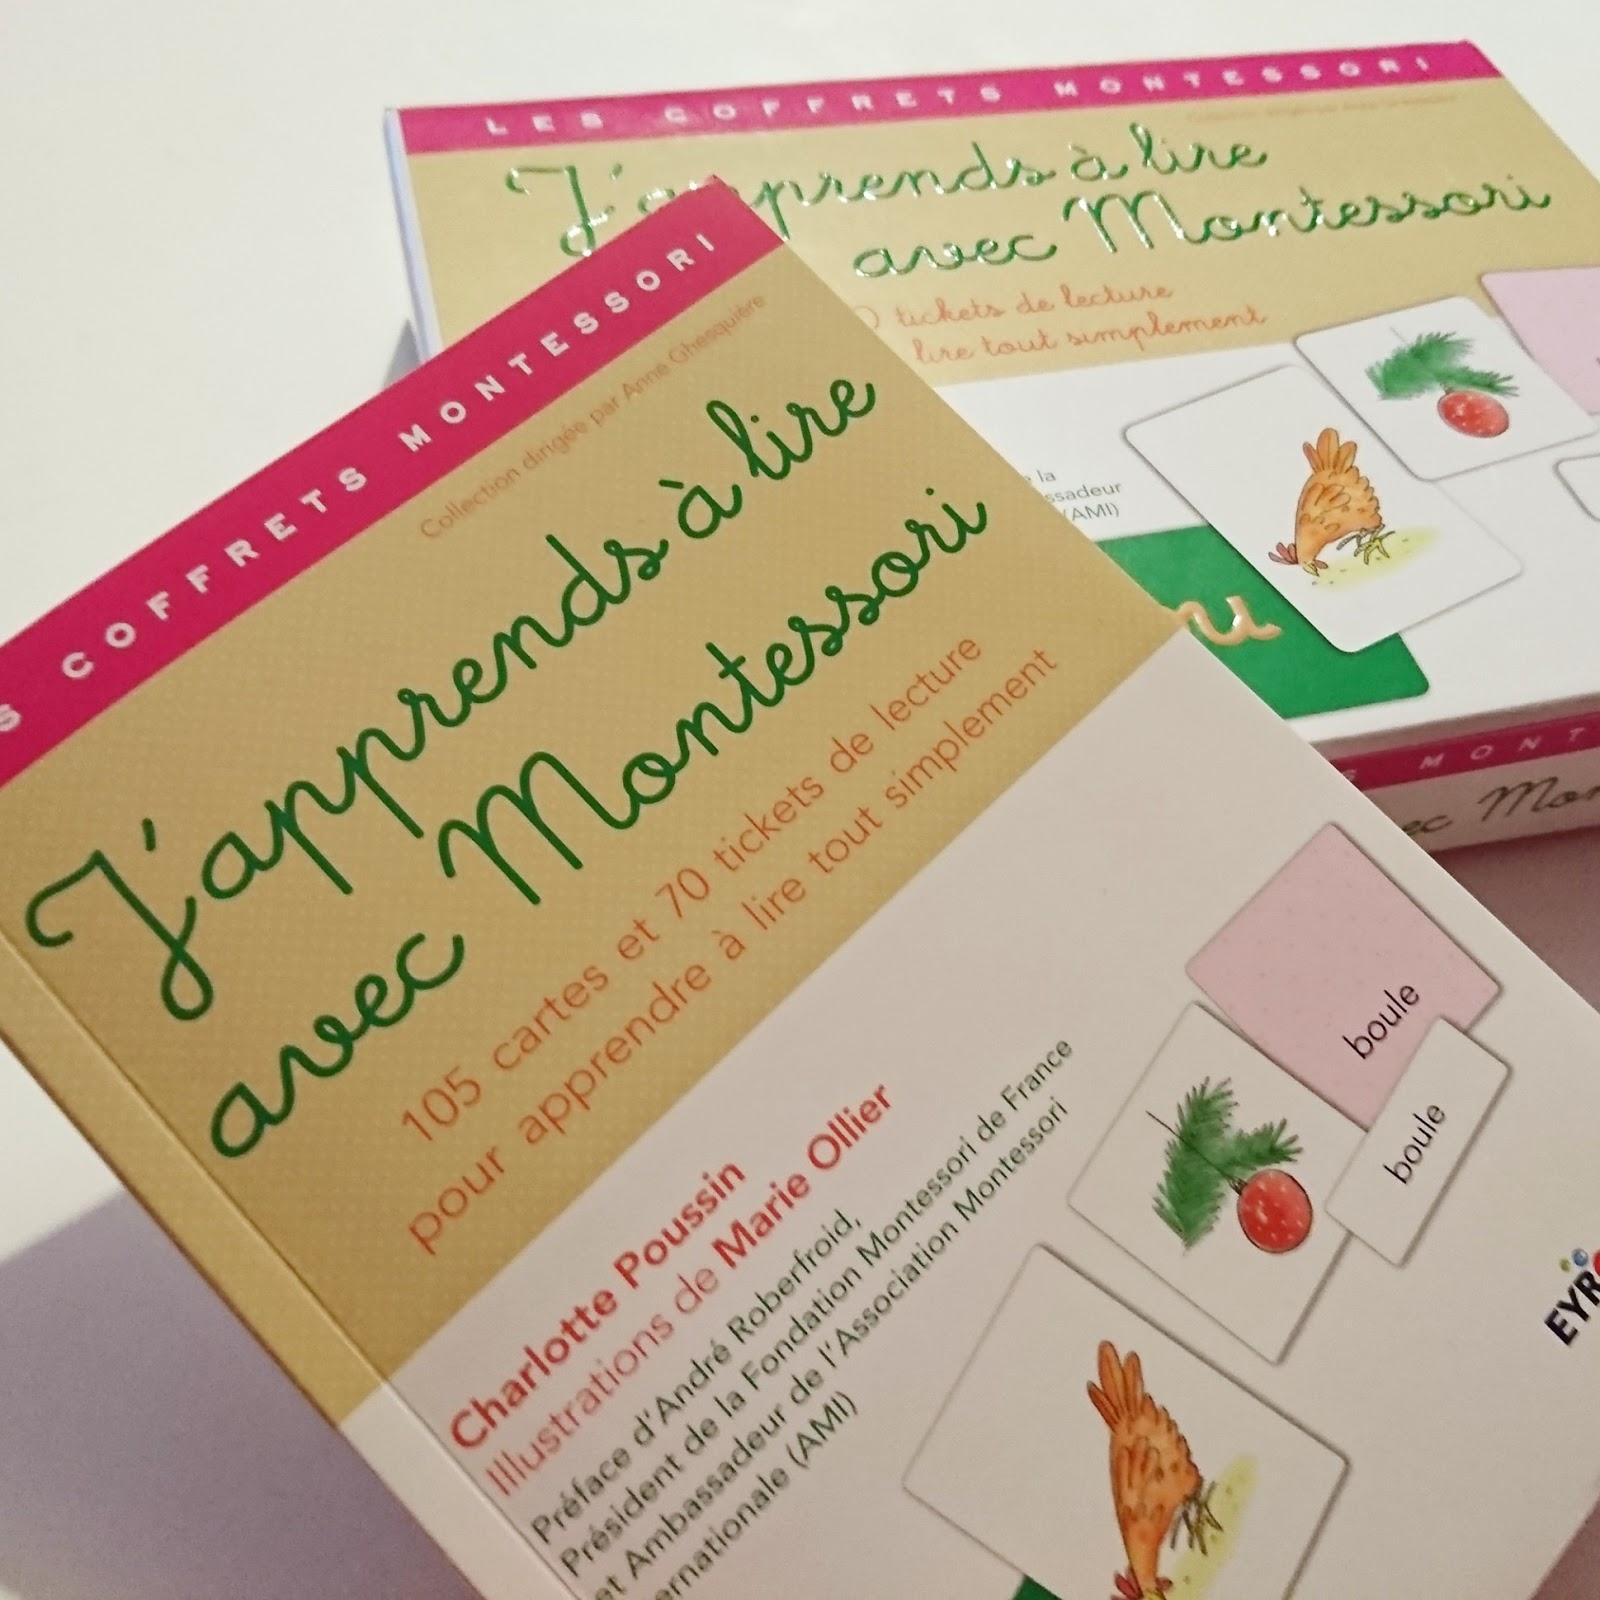 J'apprends à lire avec Montessori